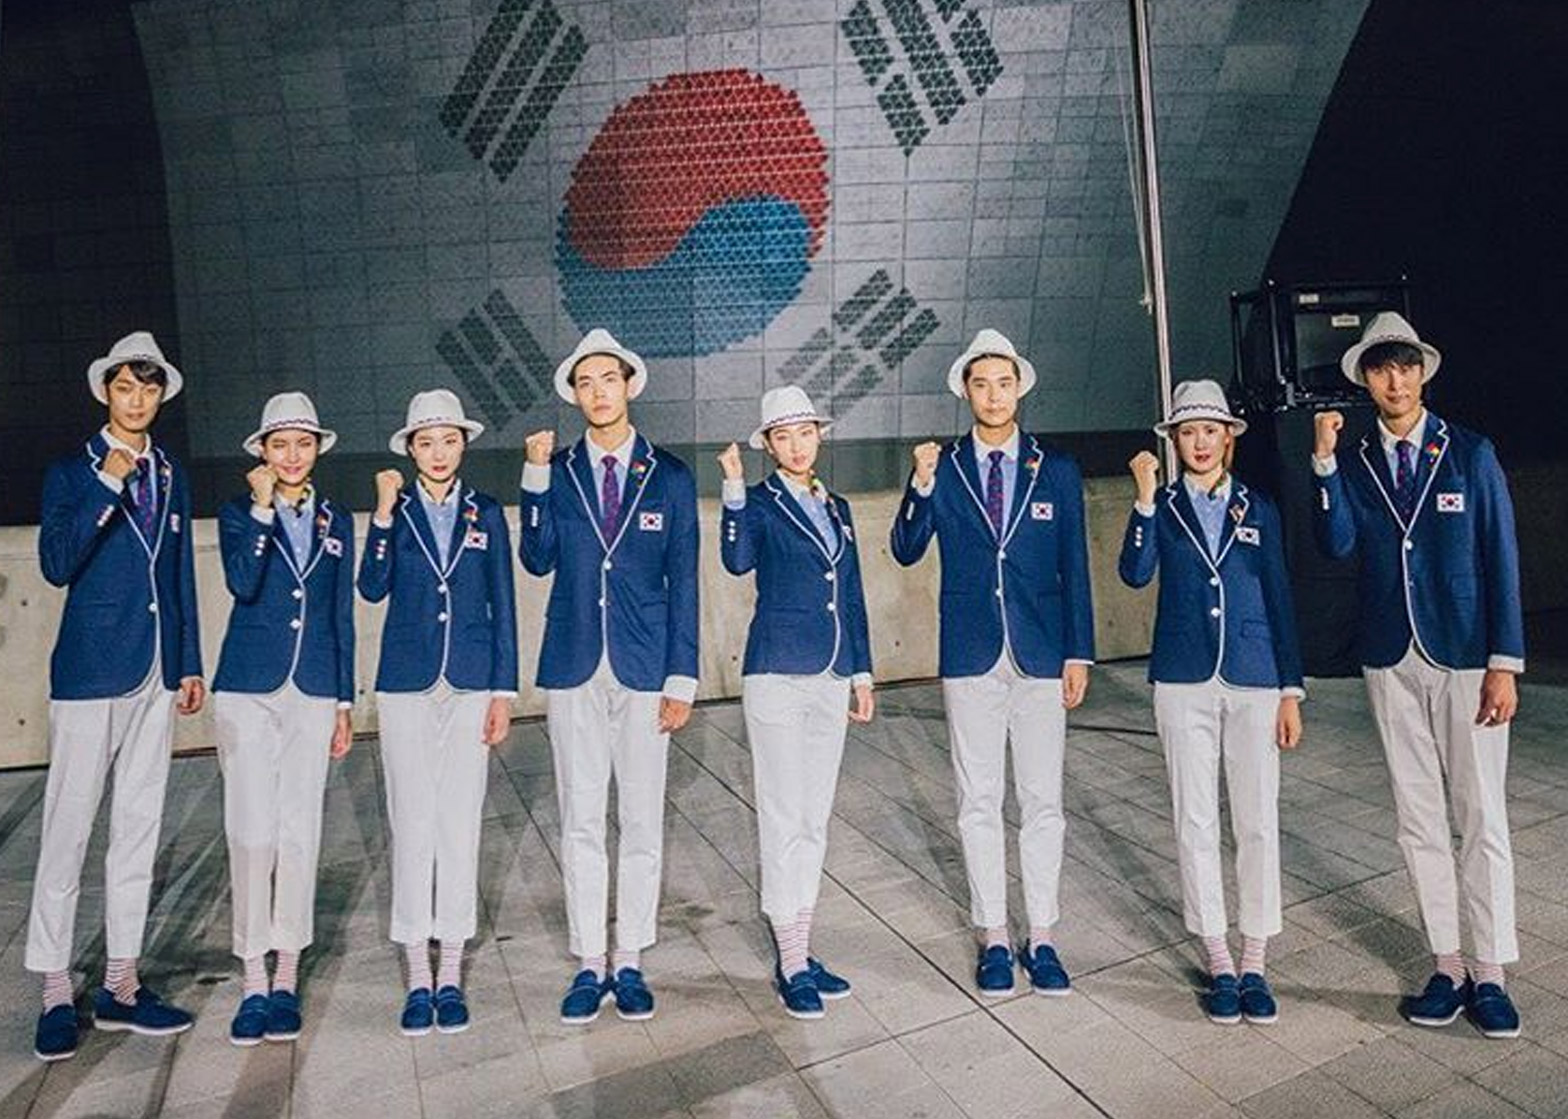 South Korea's Zika-proof Olympic uniforms